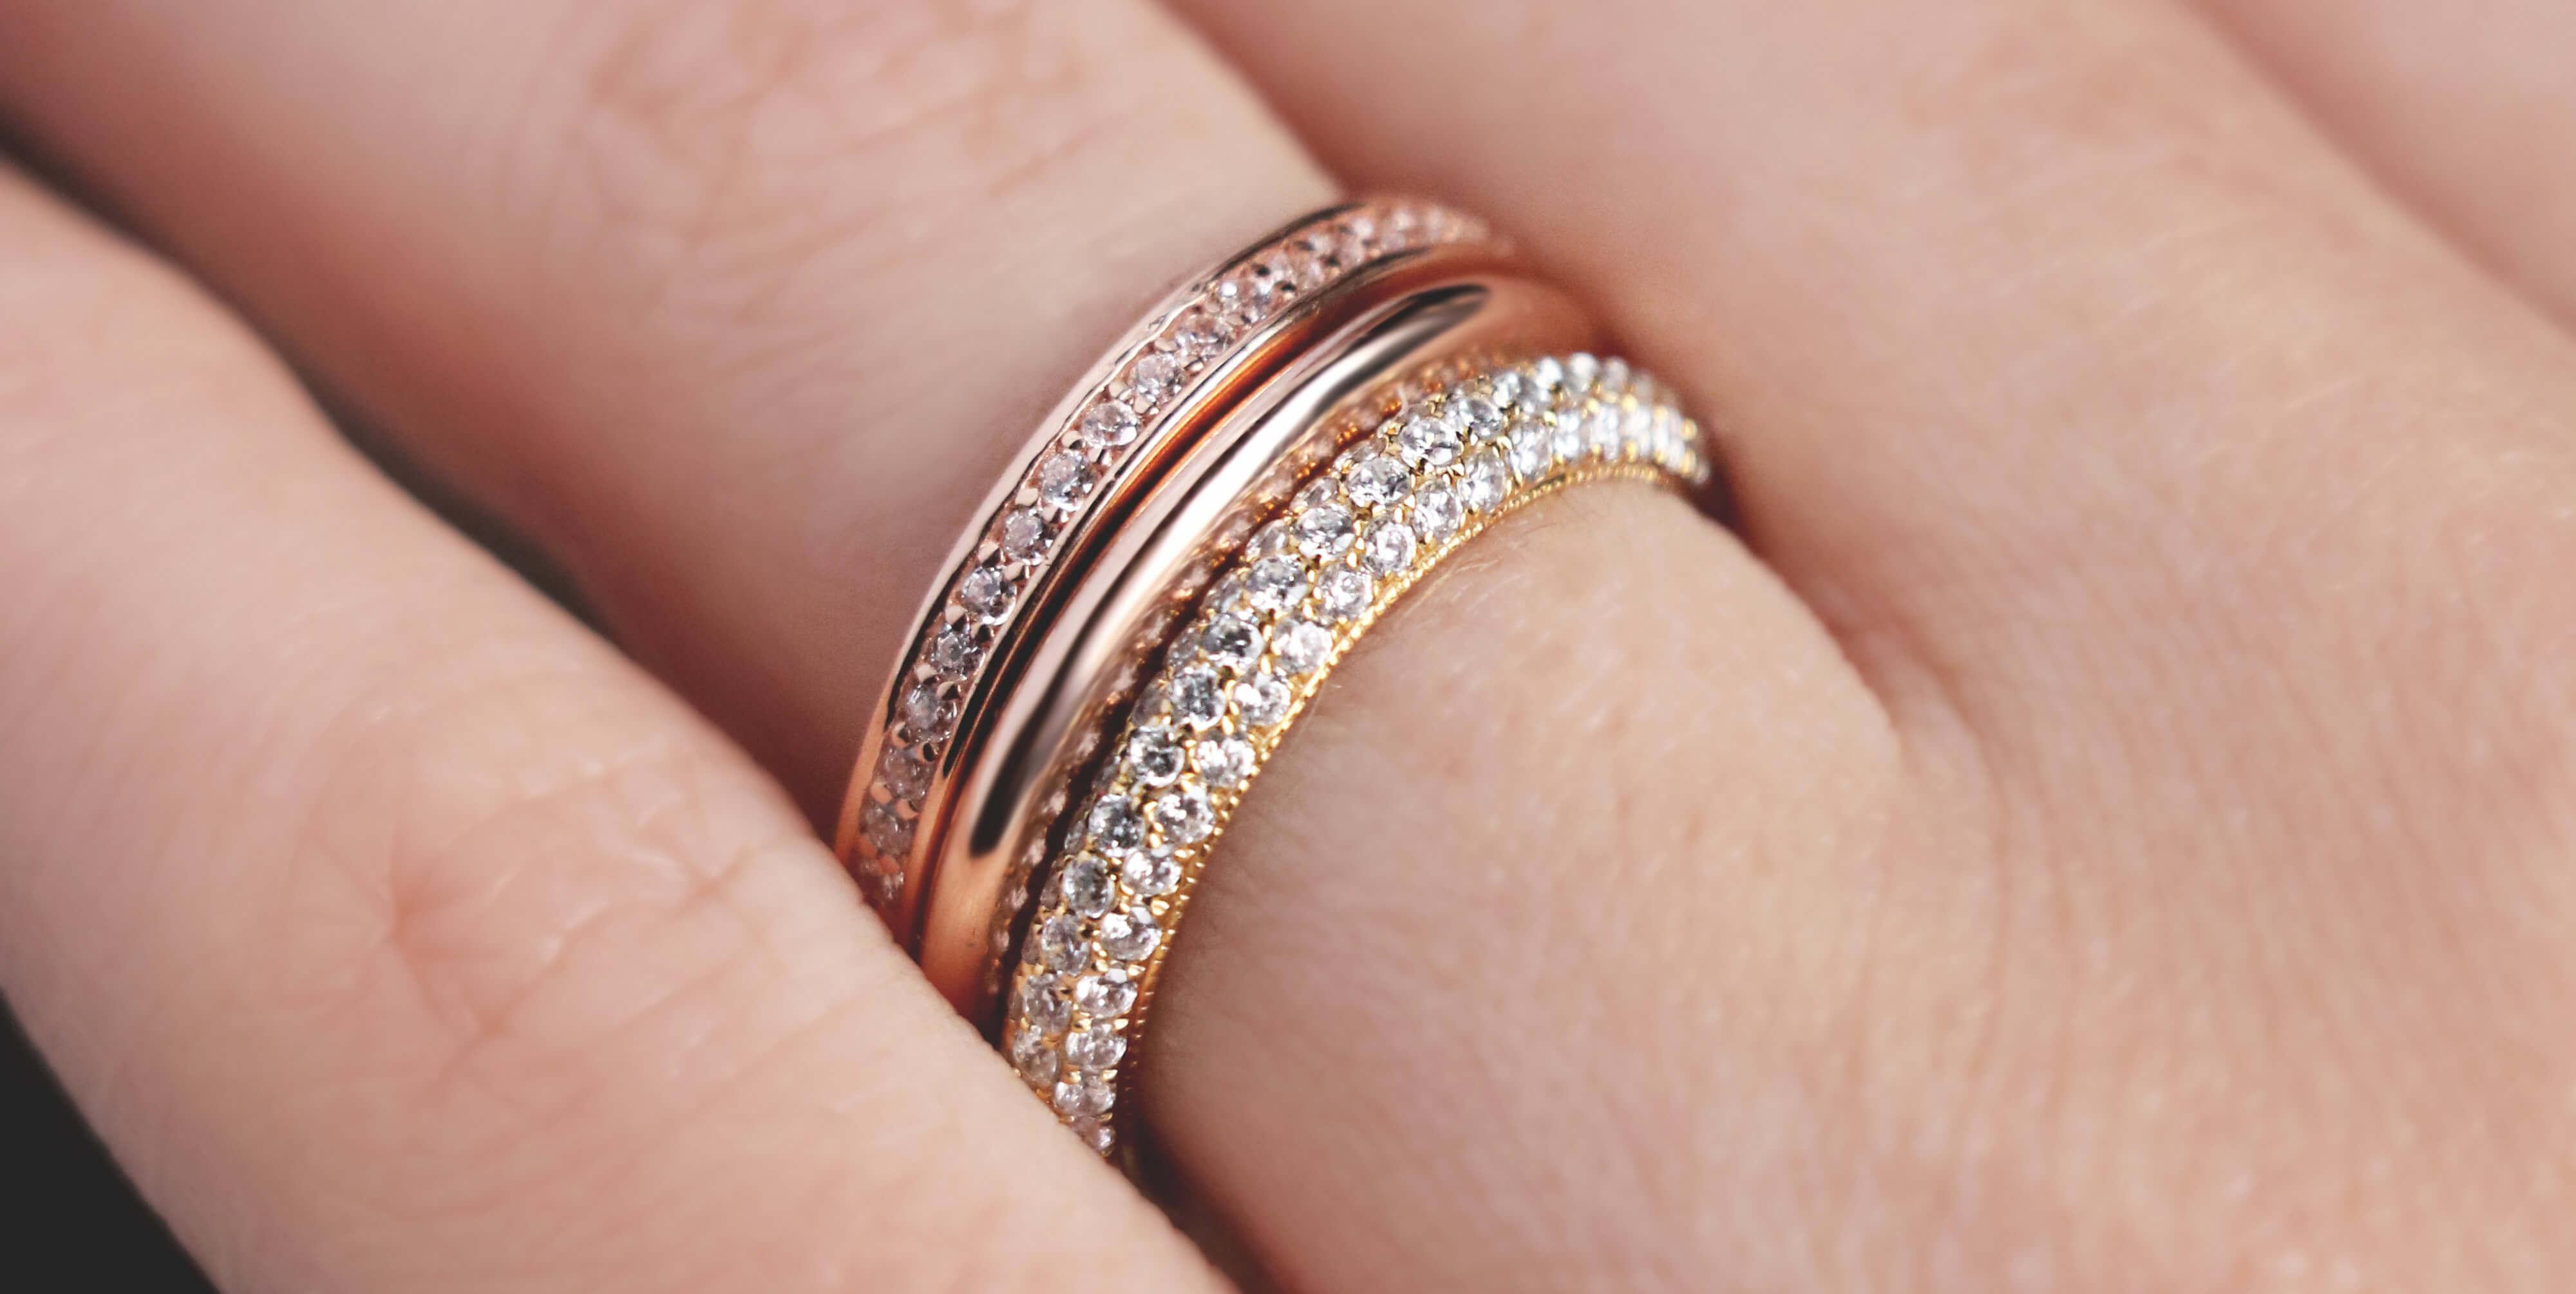 A Diamond Nexus wedding band stack with mixed-metals